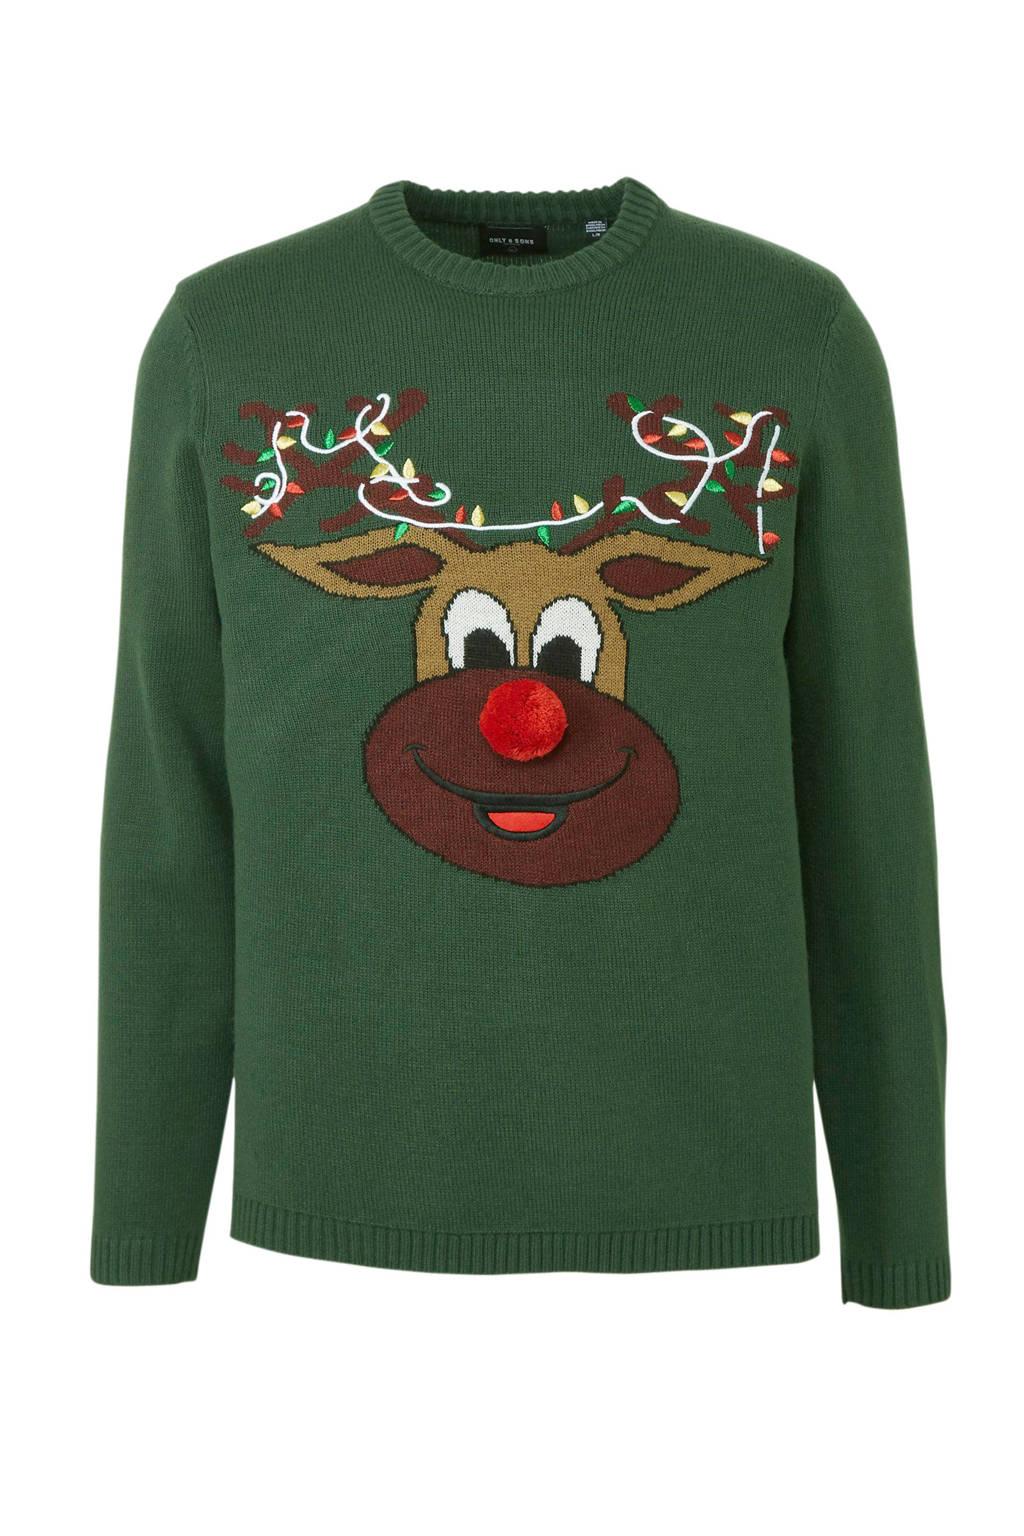 ONLY & SONS kersttrui met printopdruk groen/rood/wit/bruin, Groen/rood/wit/bruin